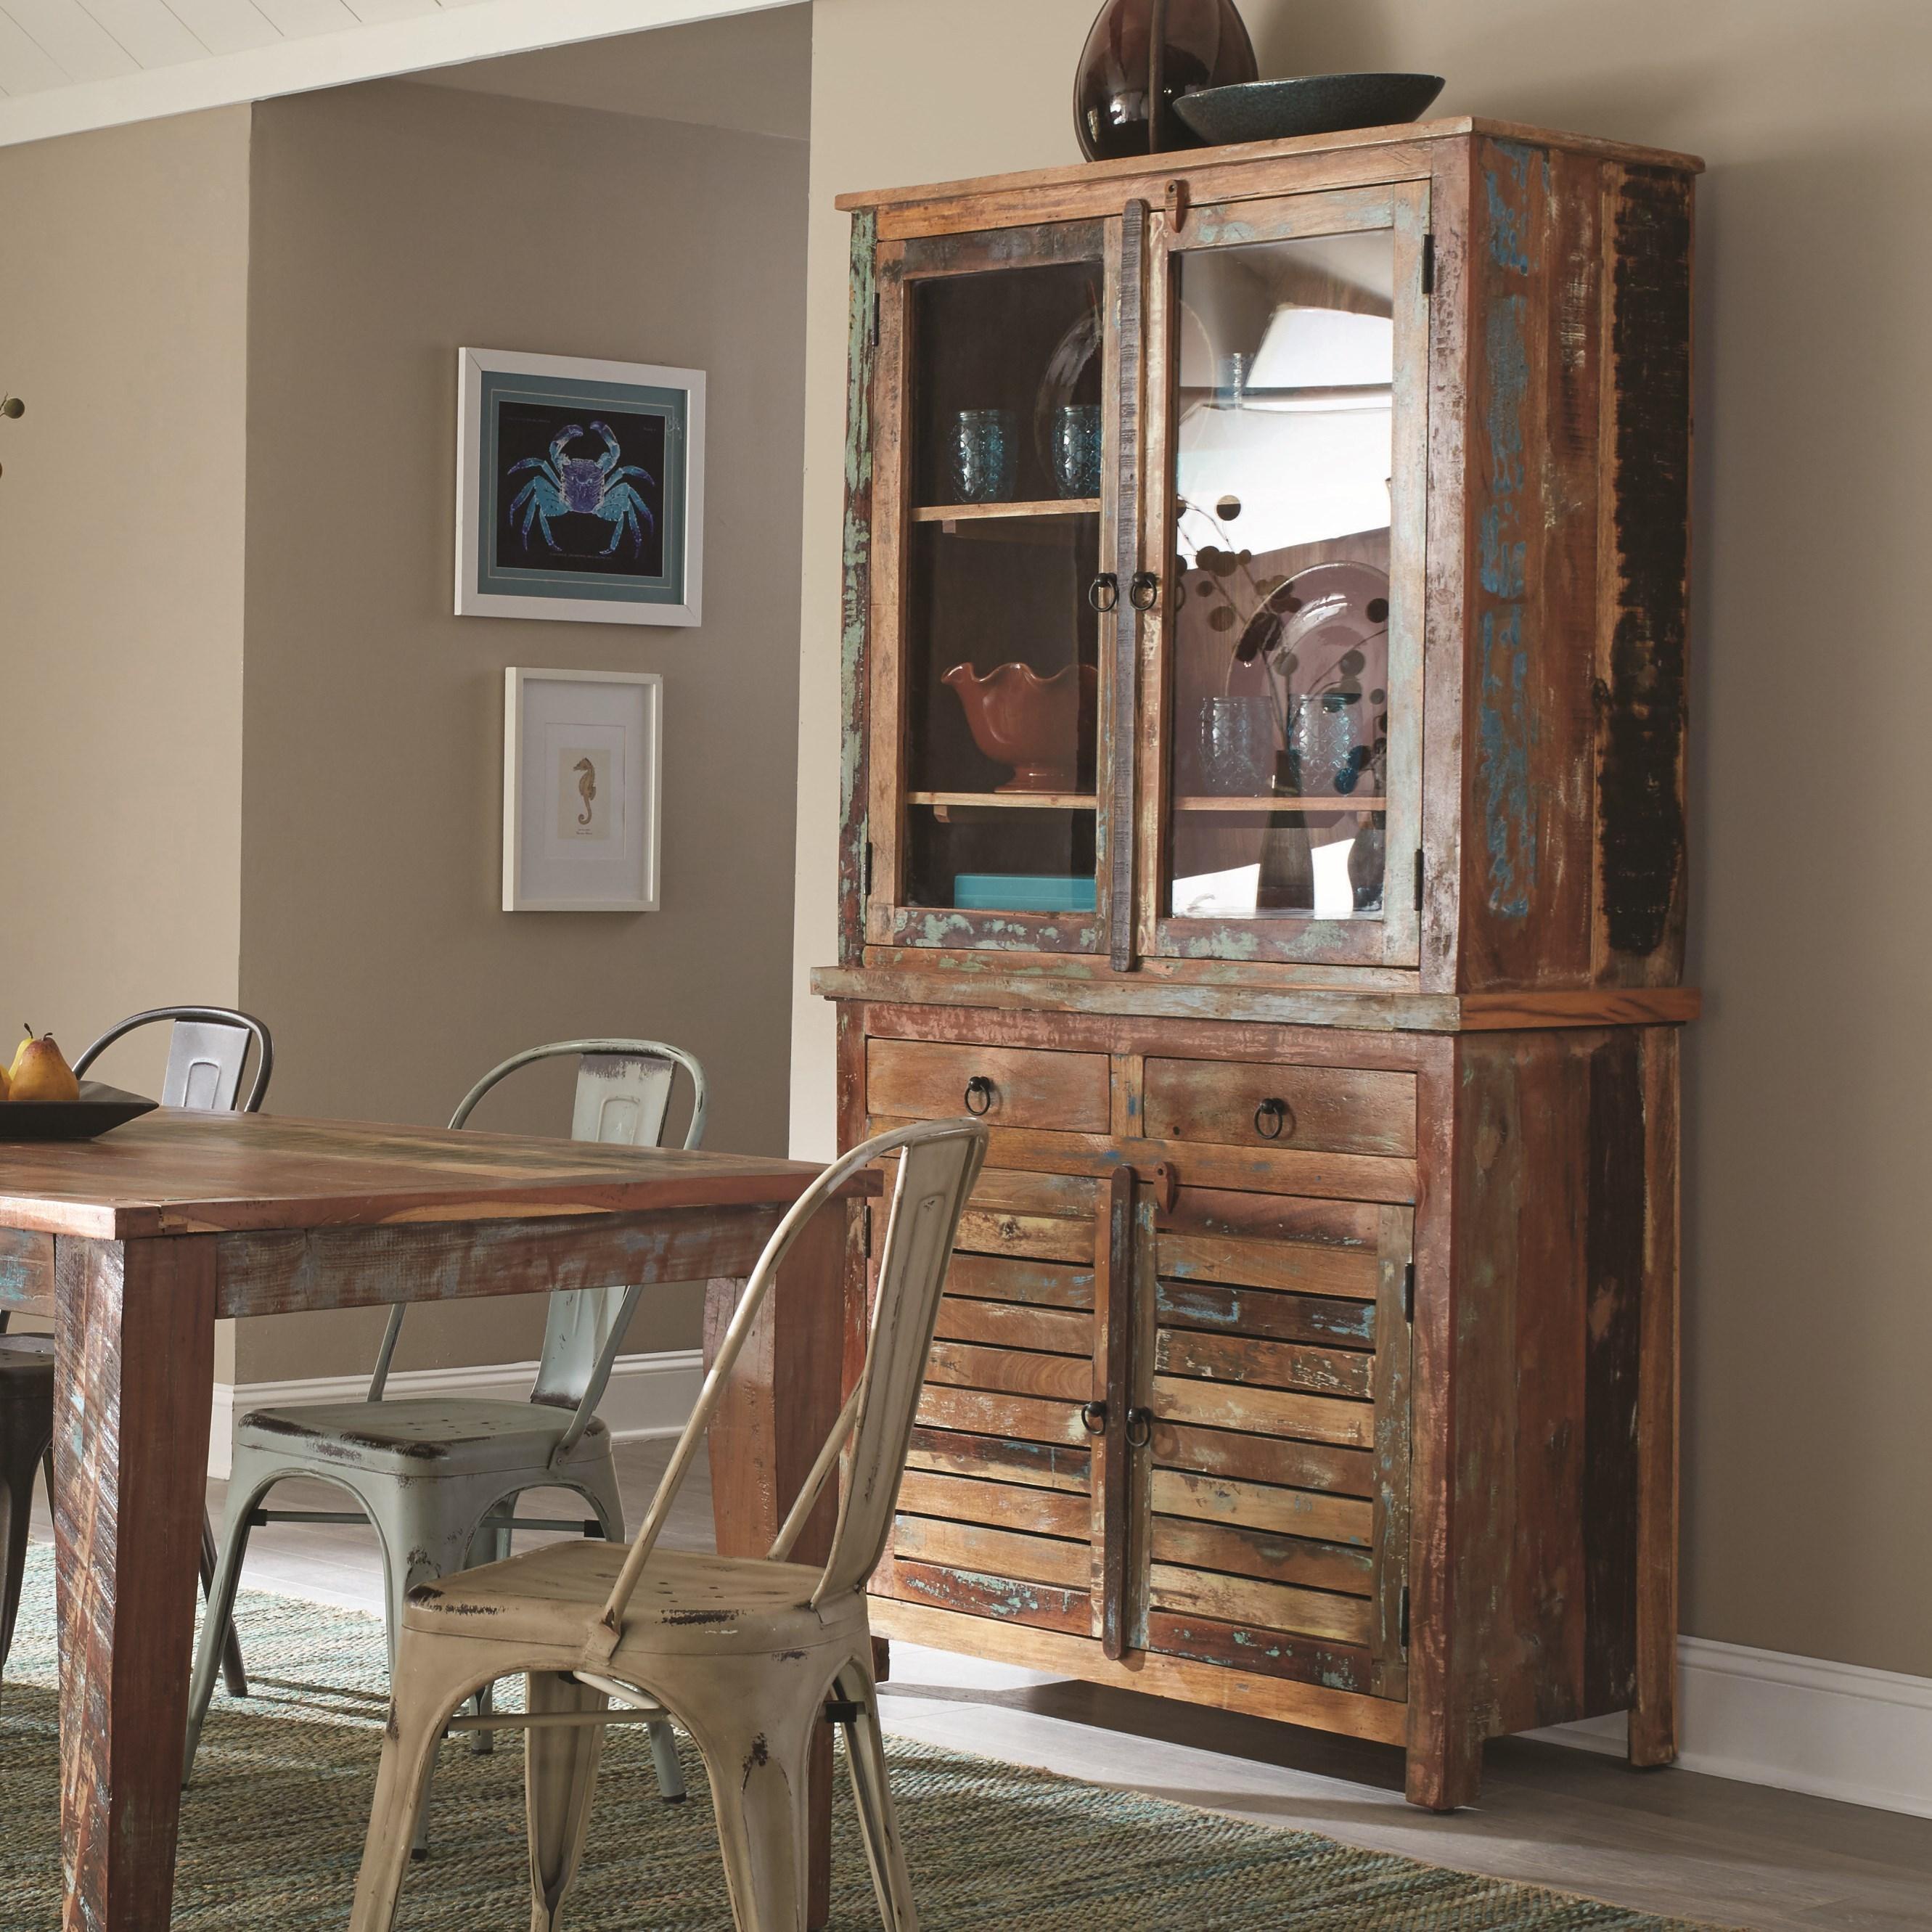 Coaster KellerChina Cabinet; Coaster KellerChina Cabinet